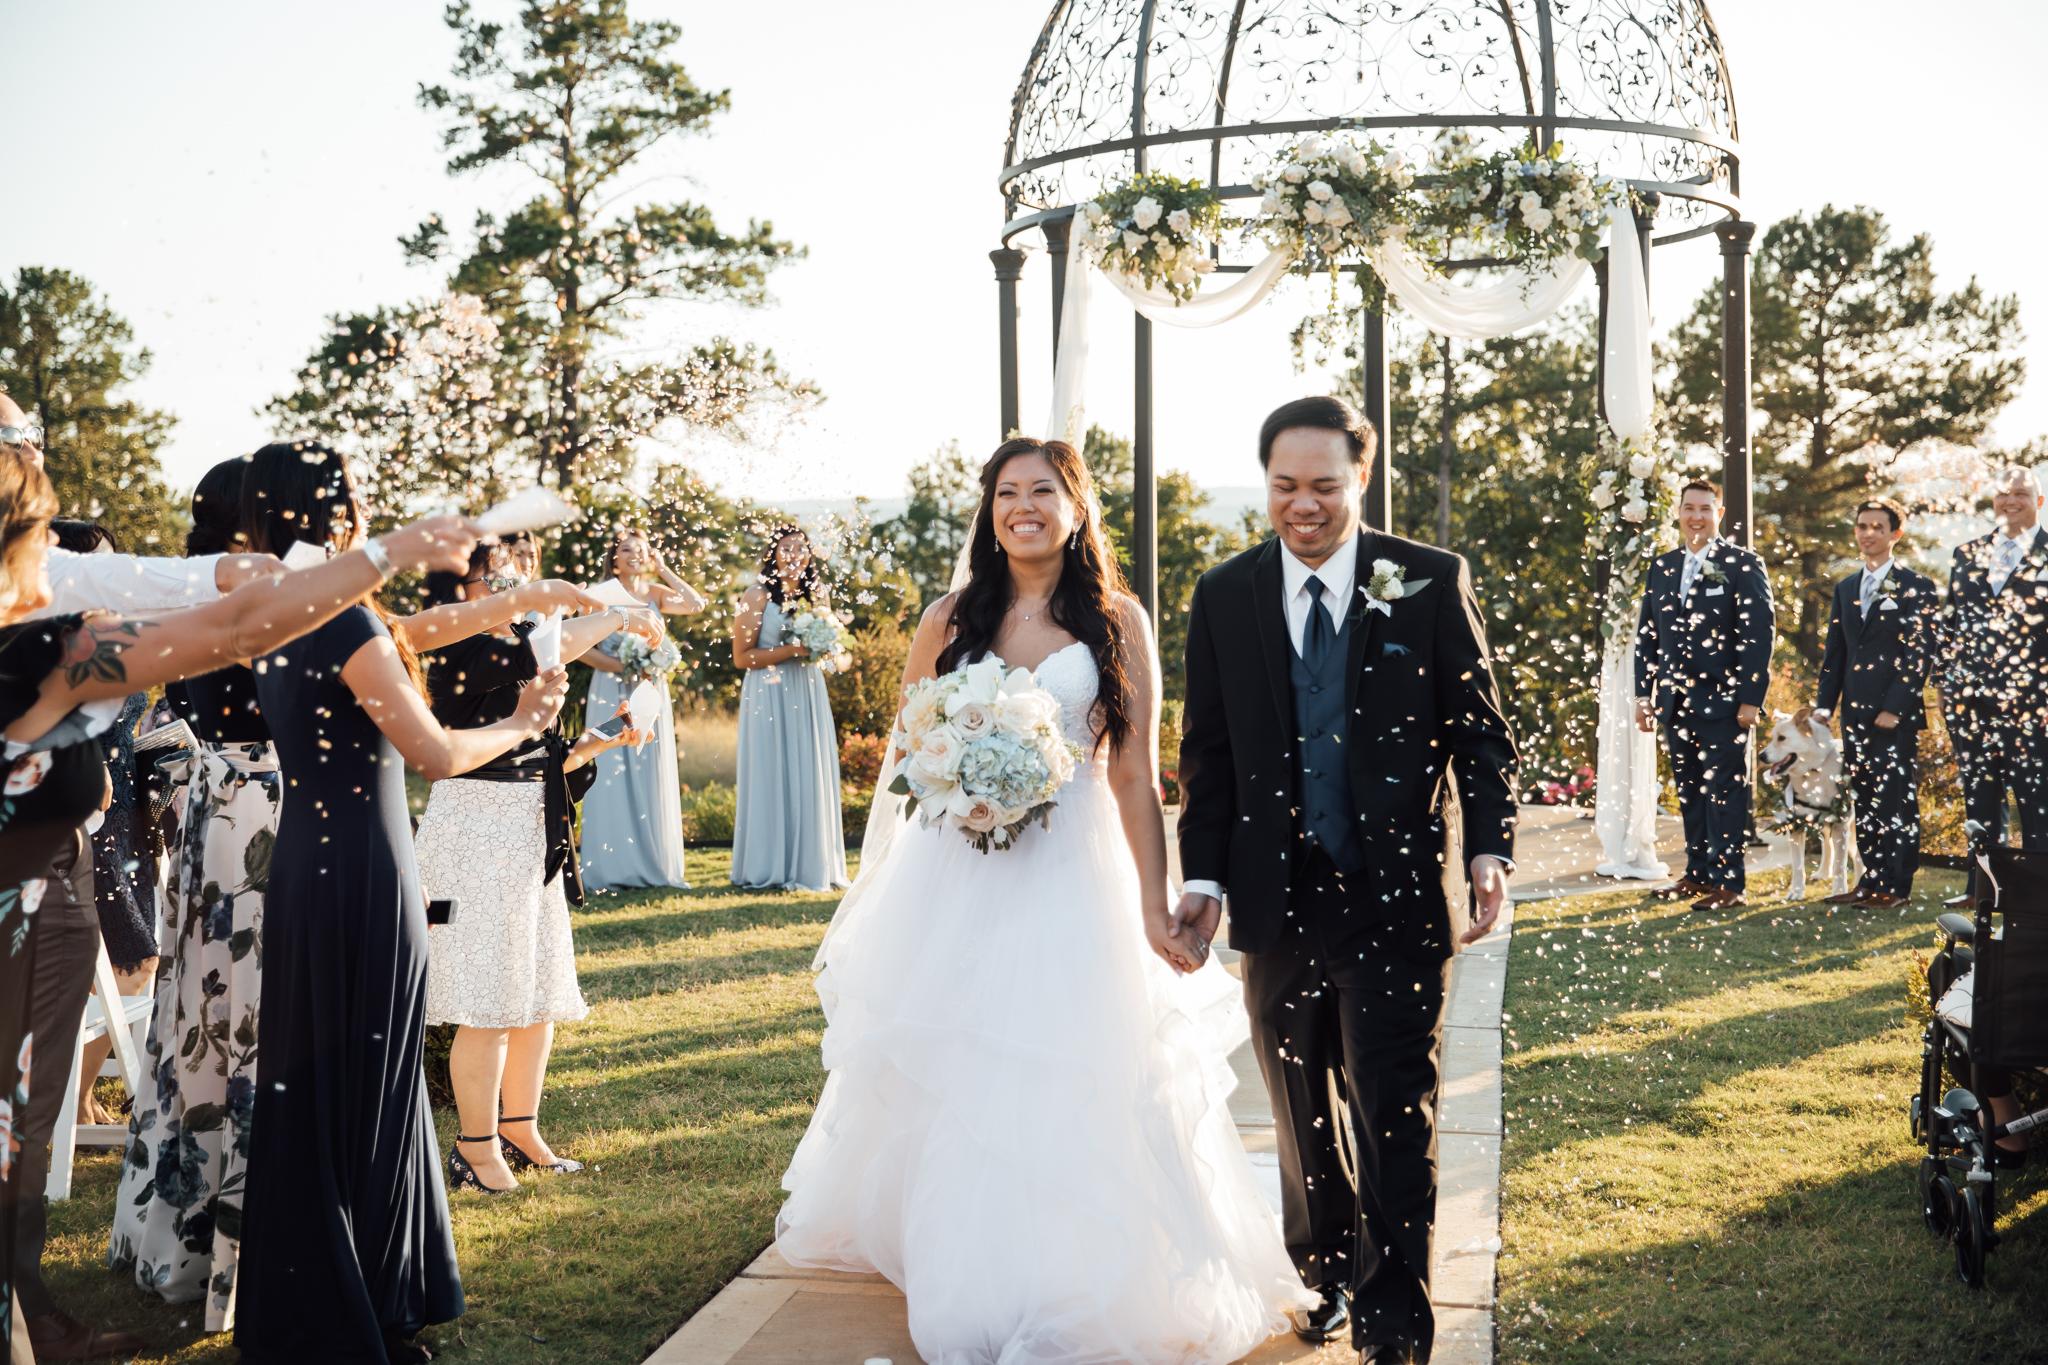 angelos-garden-little-rock-arkansas-thewarmtharoundyou-wedding-photographers (5 of 26).jpg